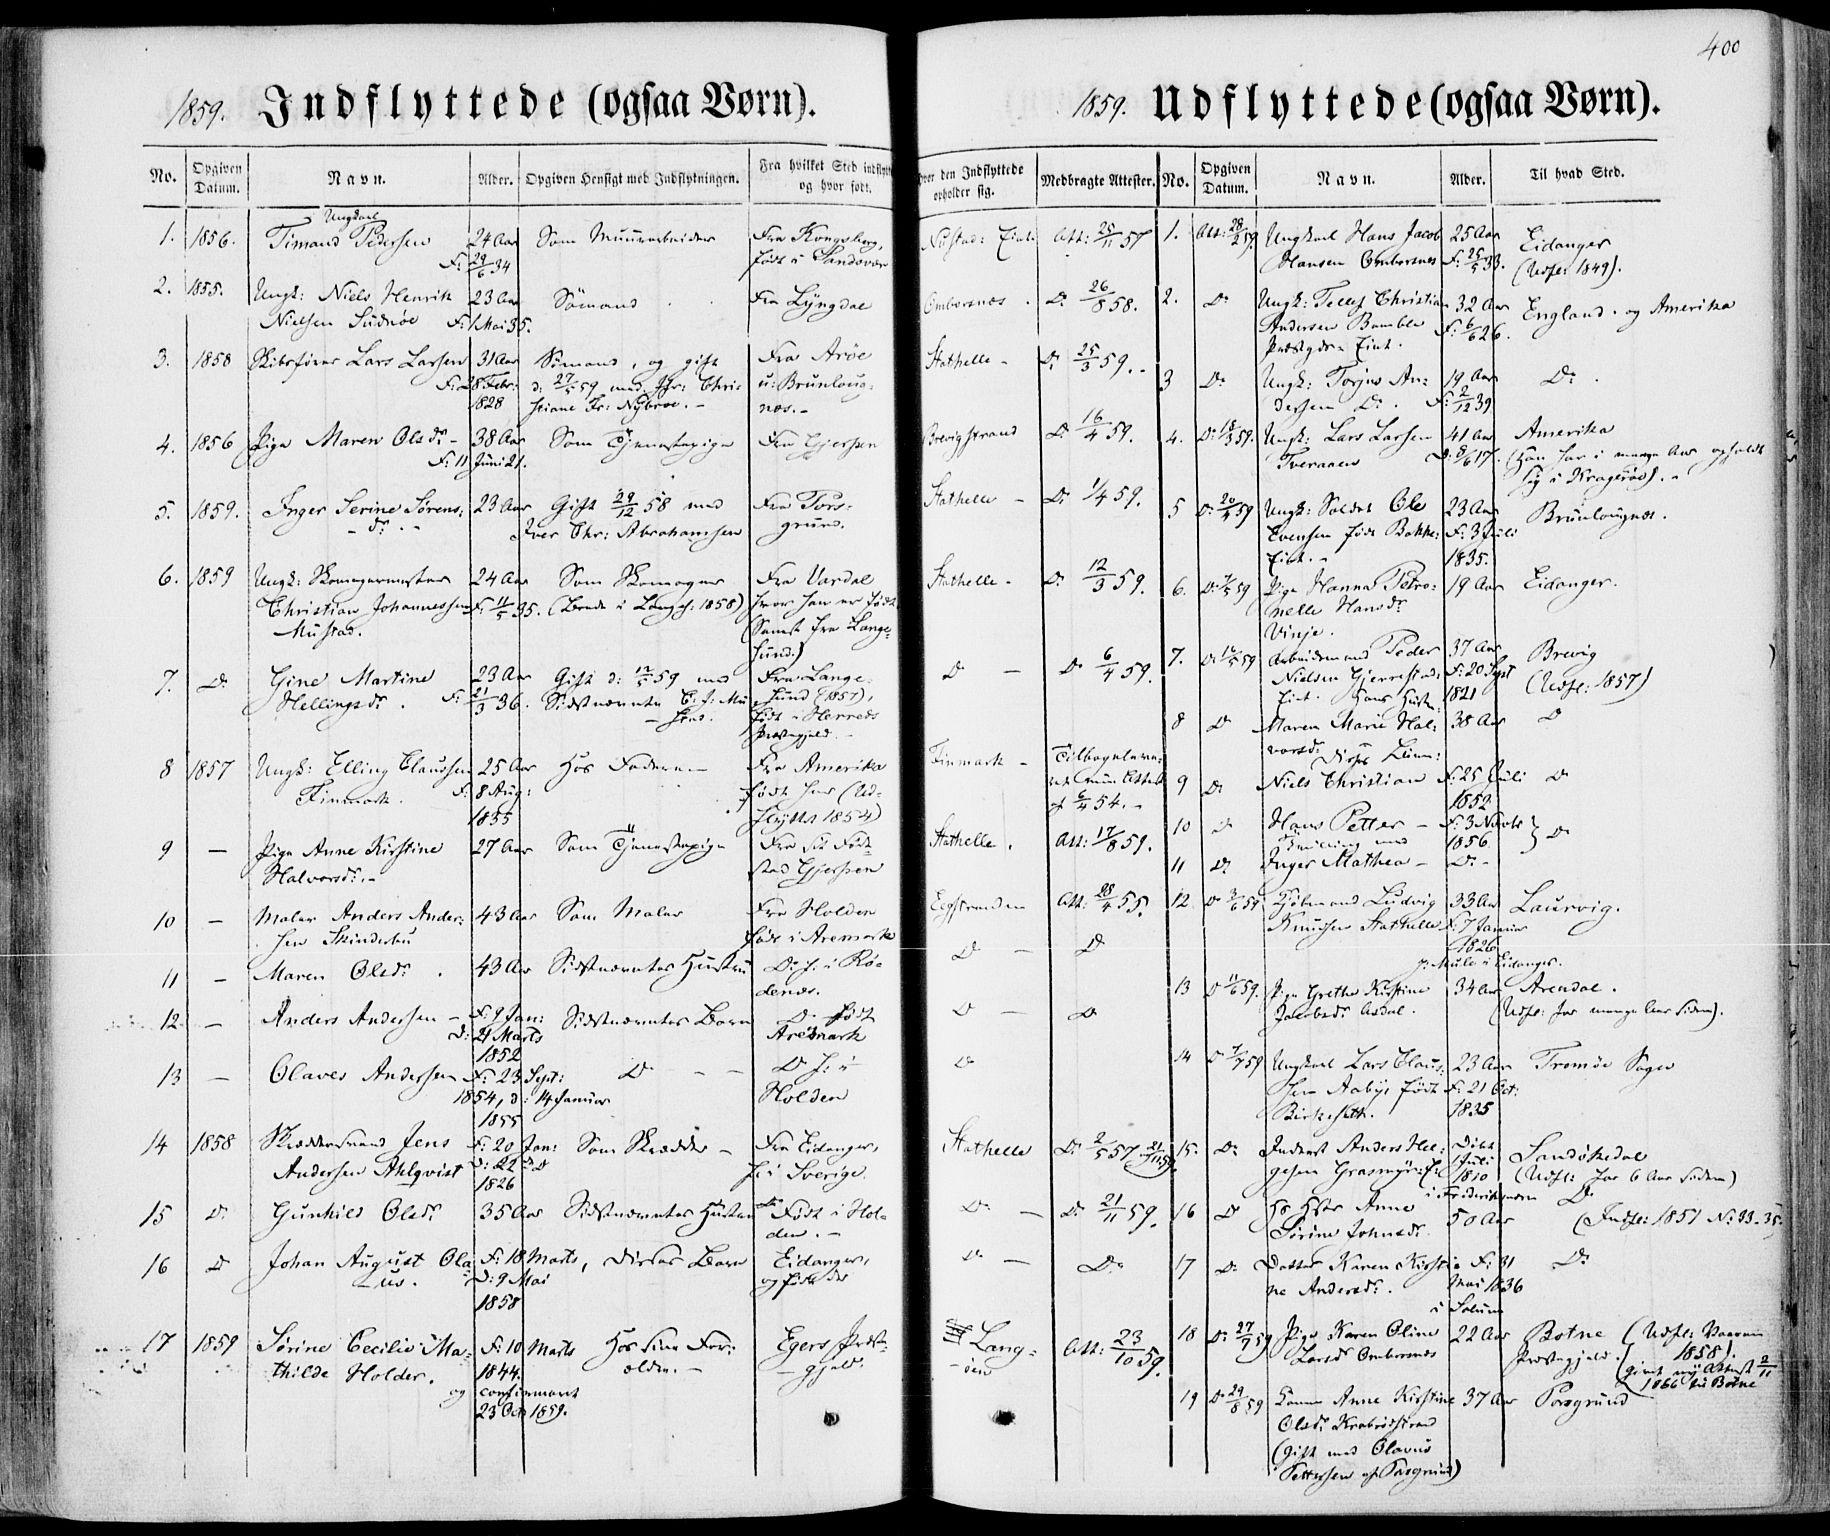 SAKO, Bamble kirkebøker, F/Fa/L0005: Ministerialbok nr. I 5, 1854-1869, s. 400